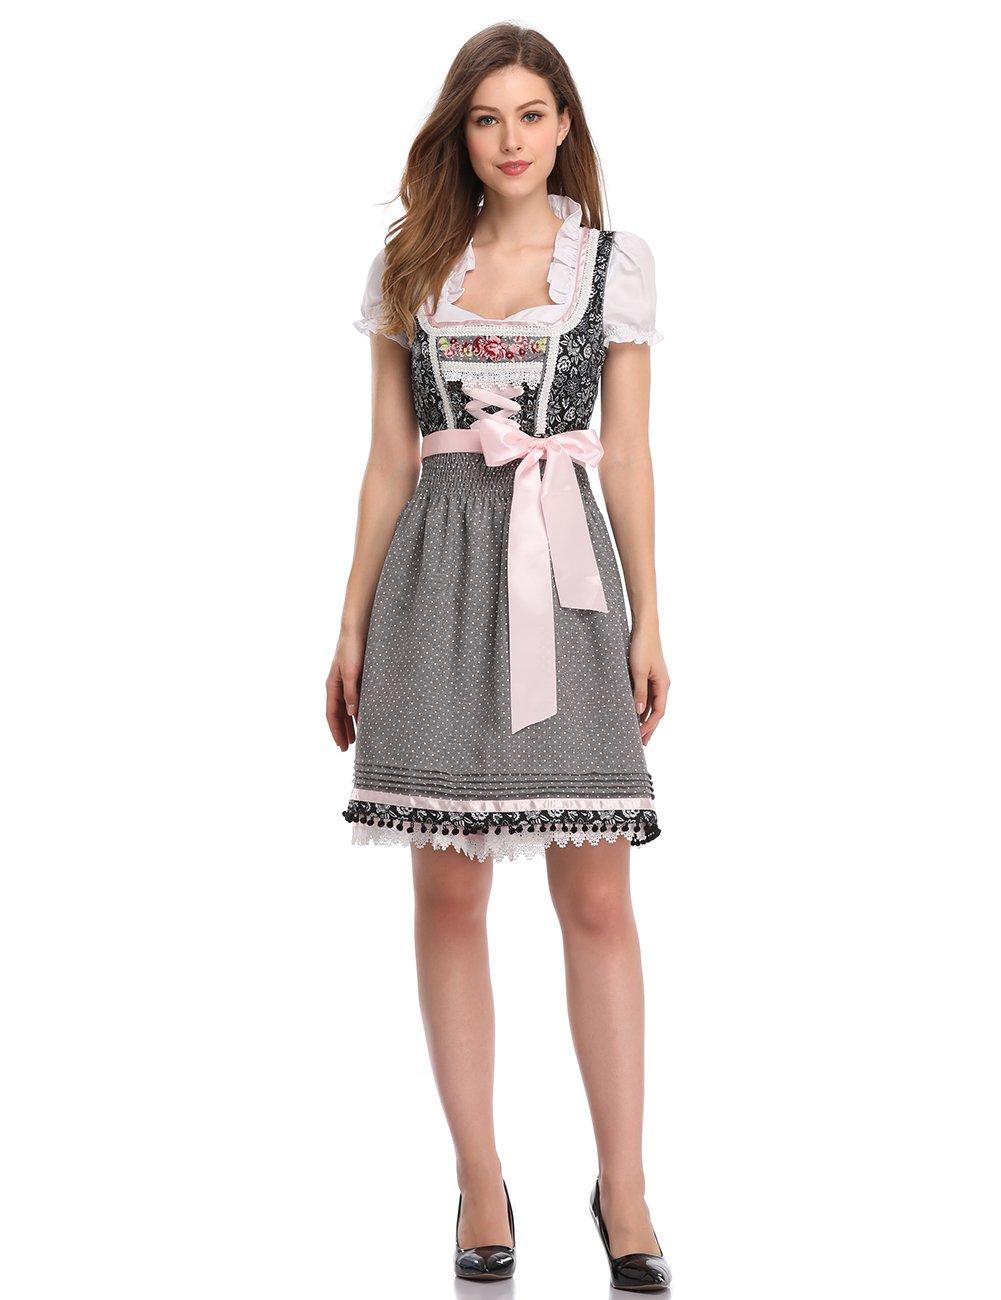 GloryStar Women's German Dirndl Dress 3 Pieces Oktoberfest Costumes (2XL, Black Grey-SZ-New)